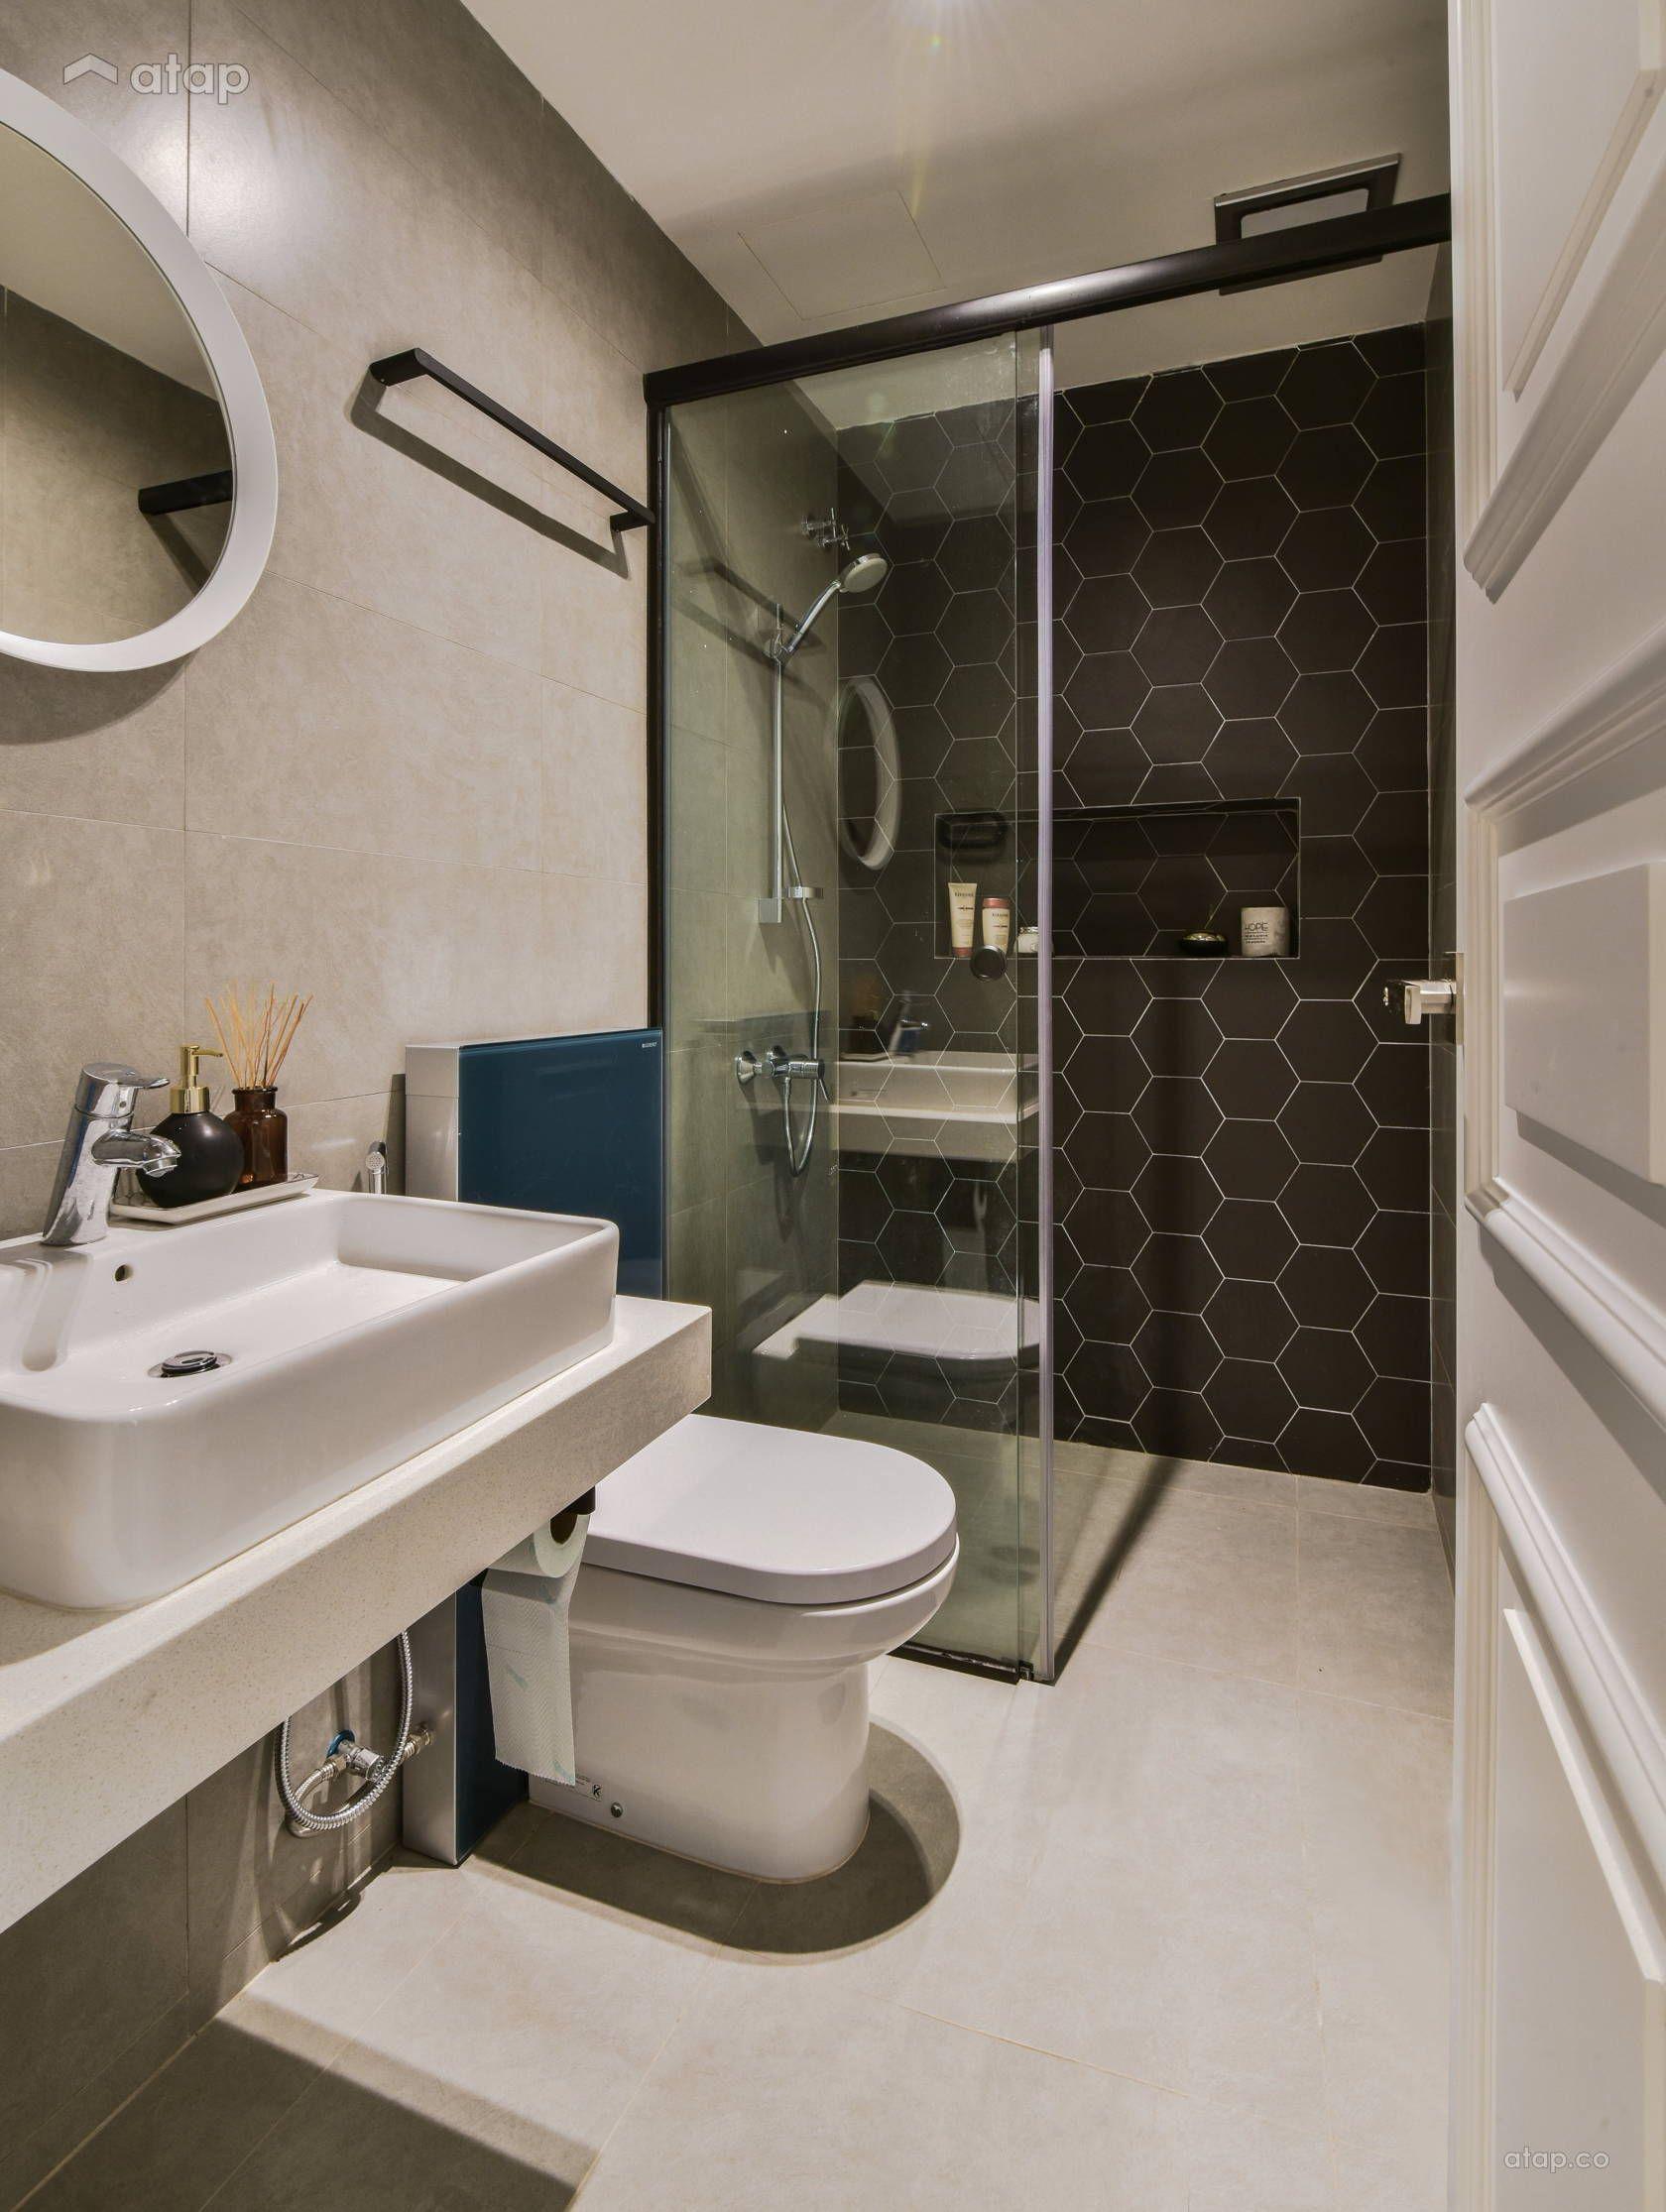 Minimalistic Scandinavian Bathroom Terrace Design Ideas Photos Malaysia Atap Co Toilet Design Scandinavian Bathroom Contemporary Bathroom Vanity